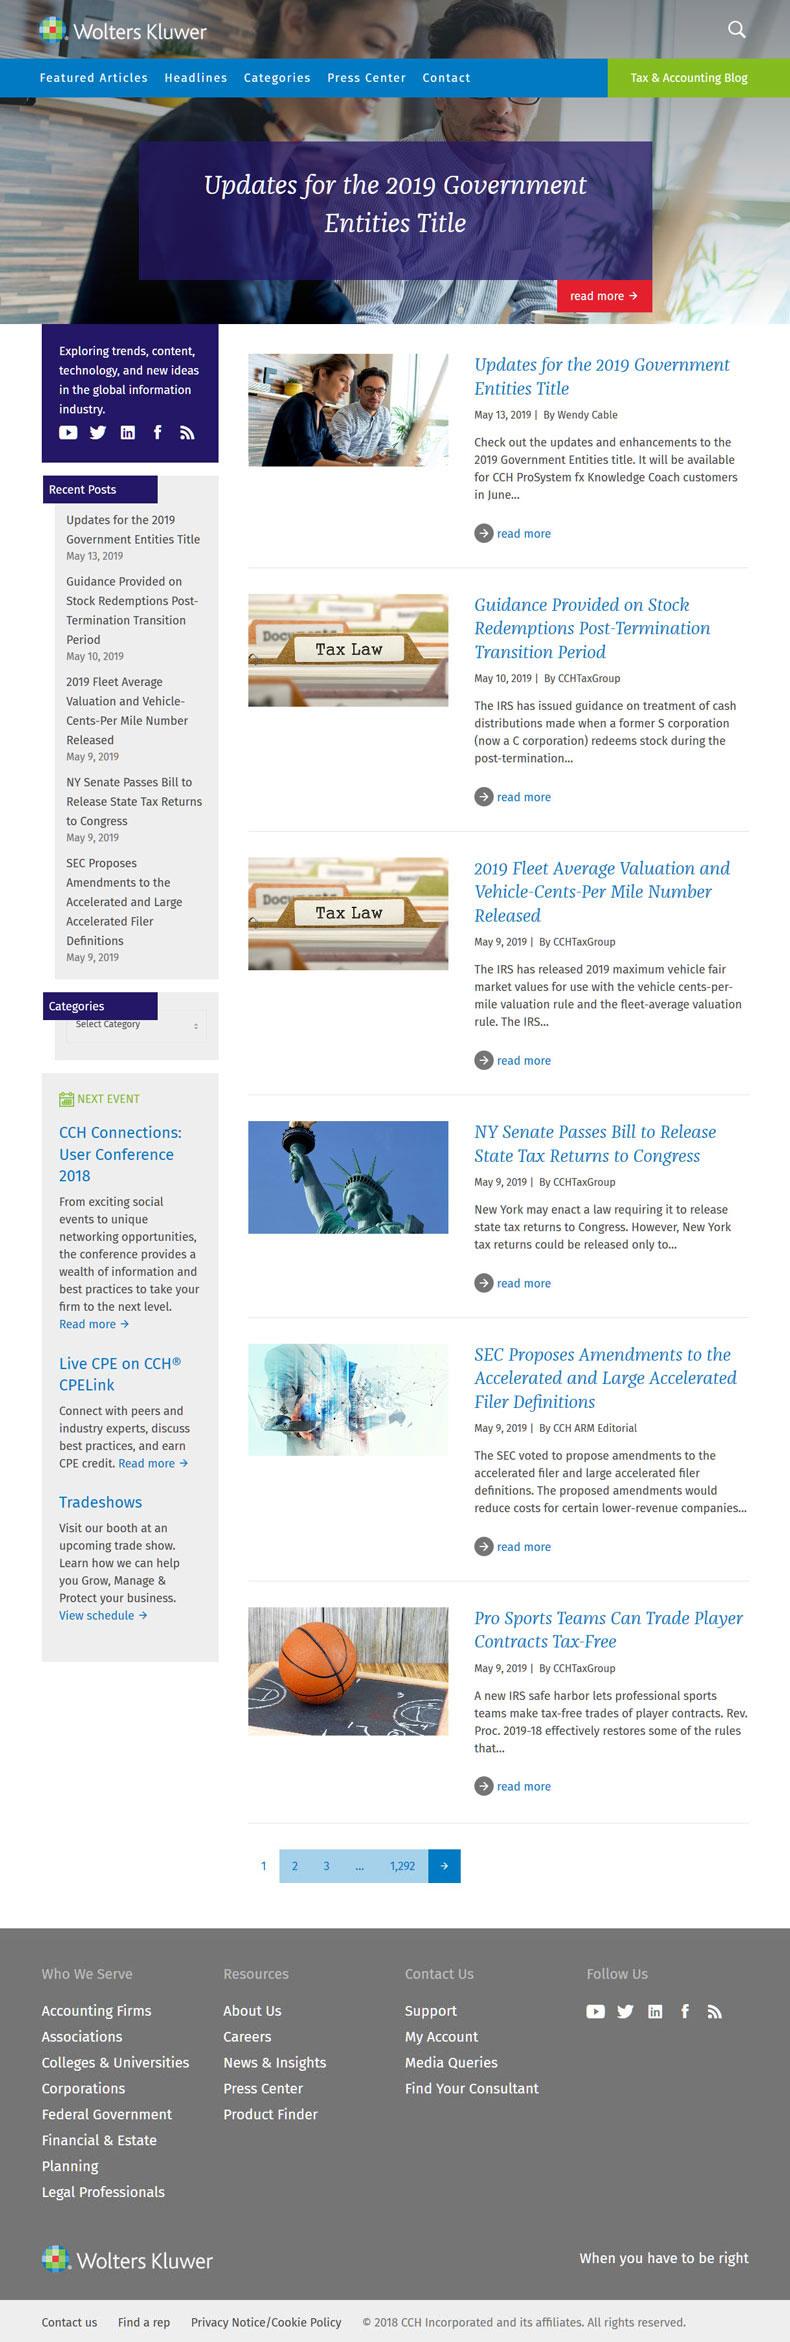 news cchgroup website